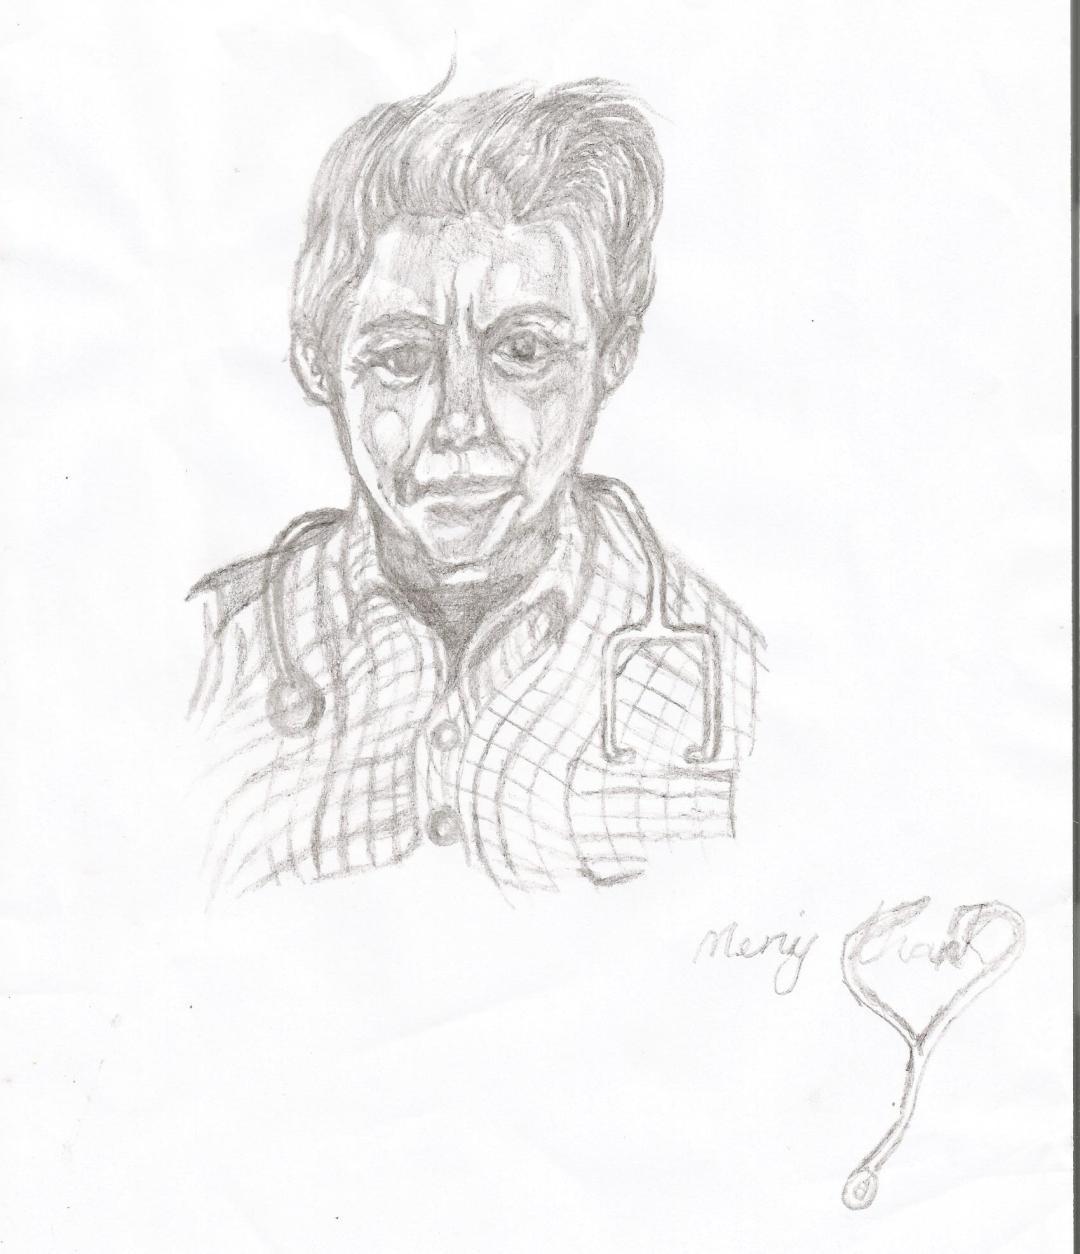 Dr. Paul Sketch